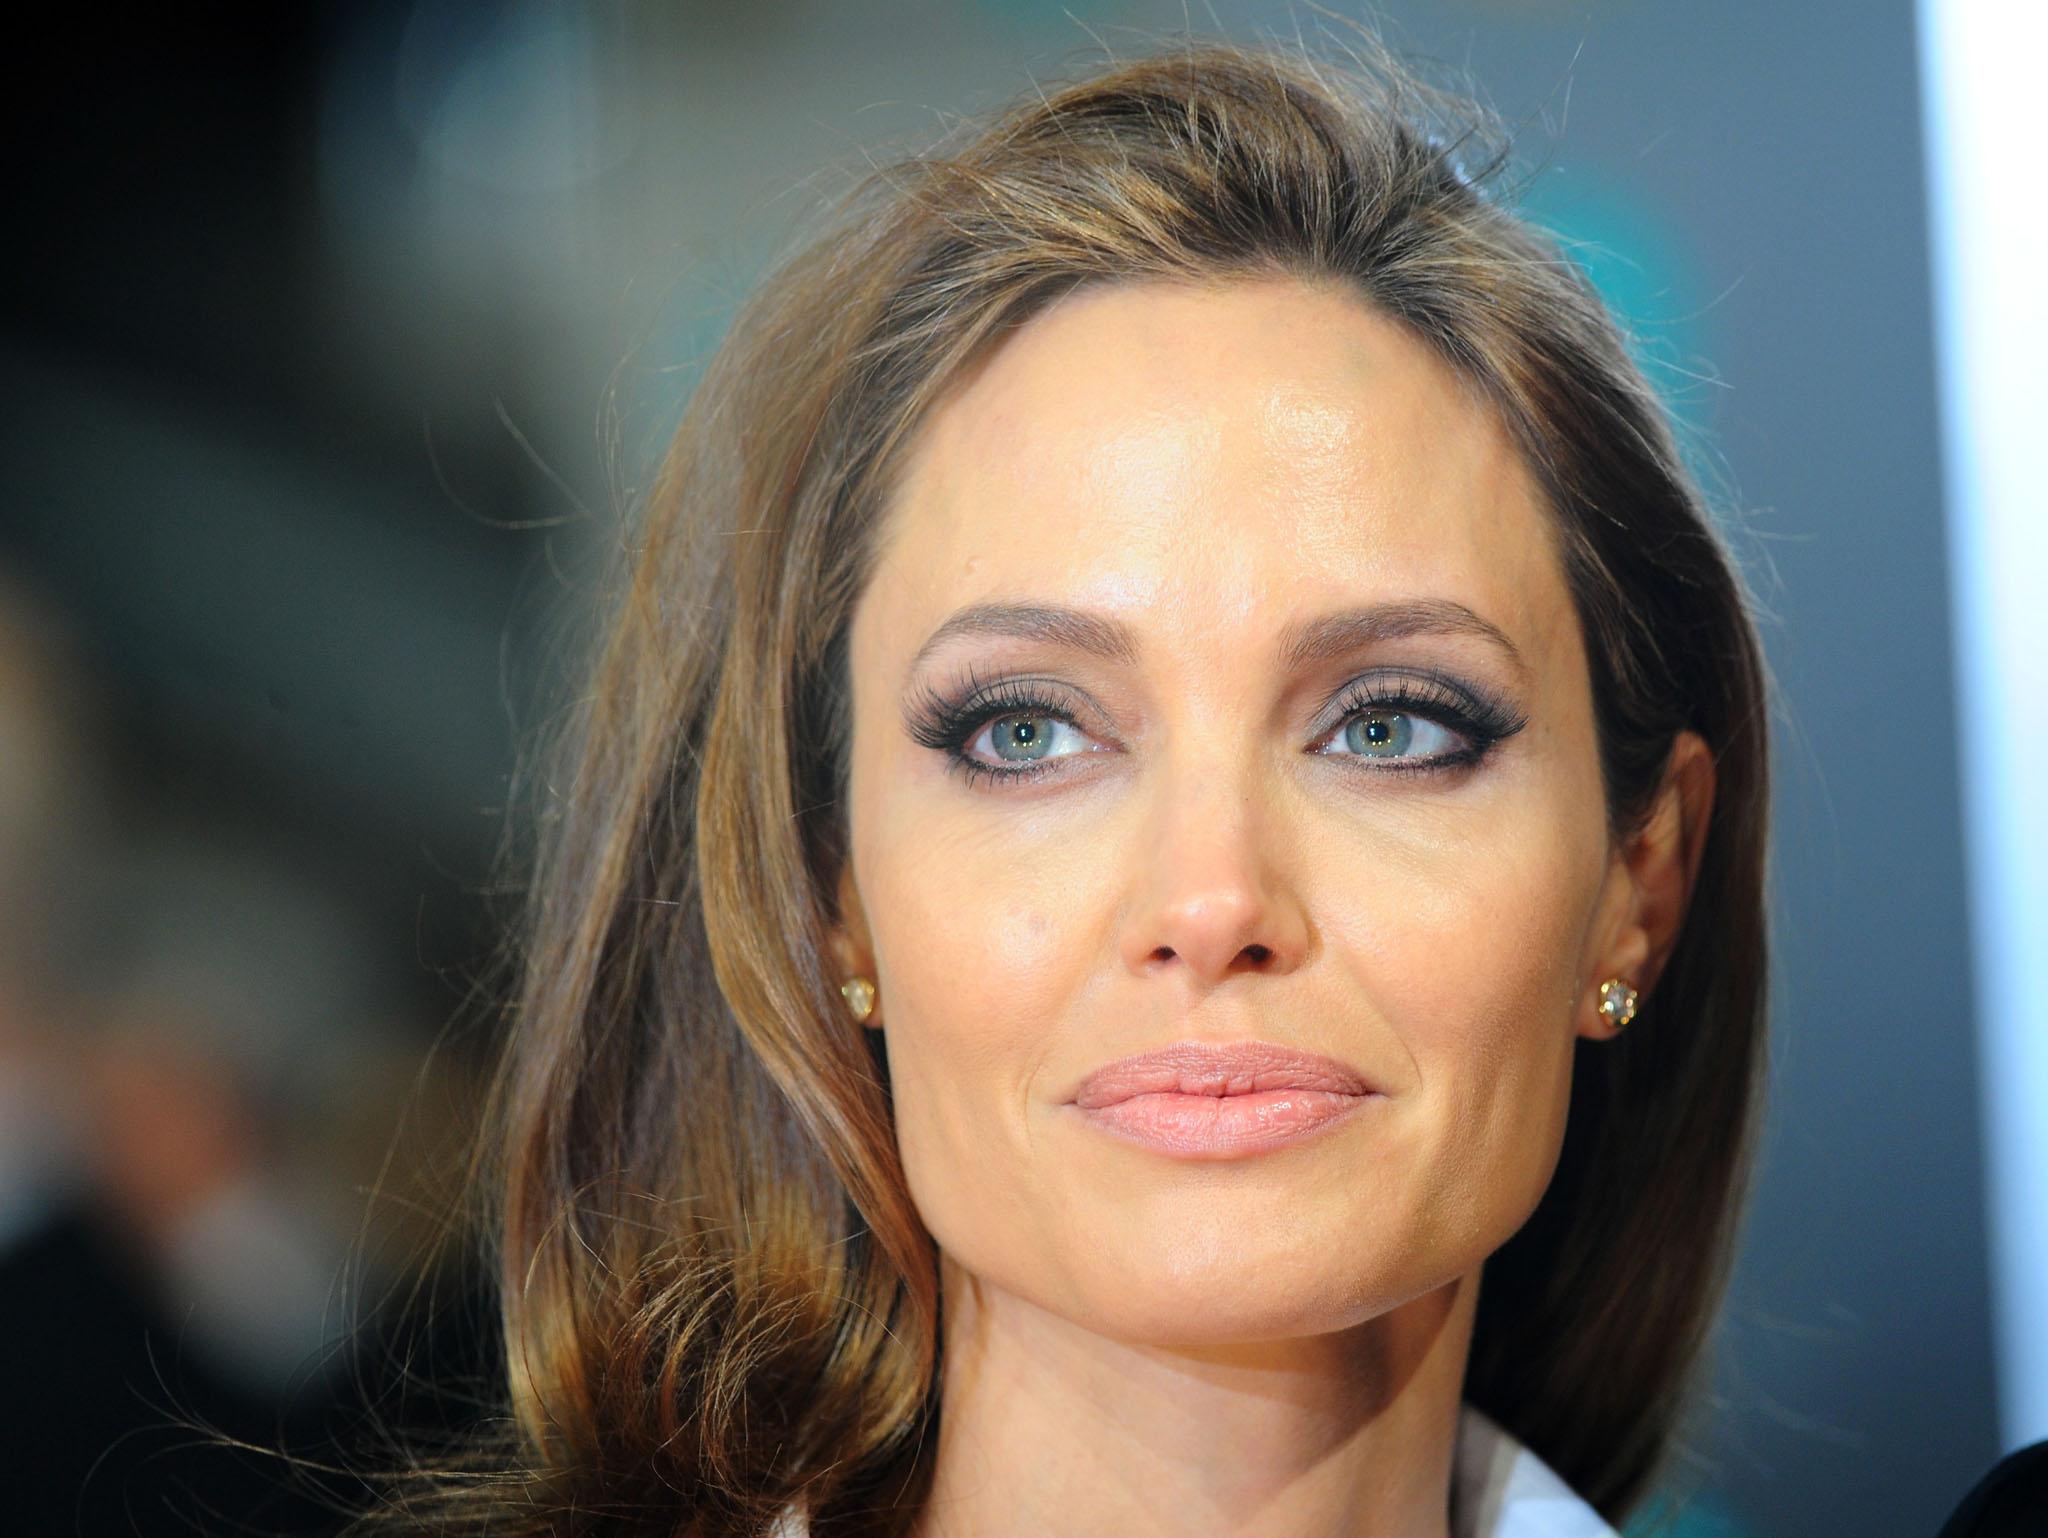 Angelina Jolie - Life #Movies Relationships #Arts Works #FrizeMedia